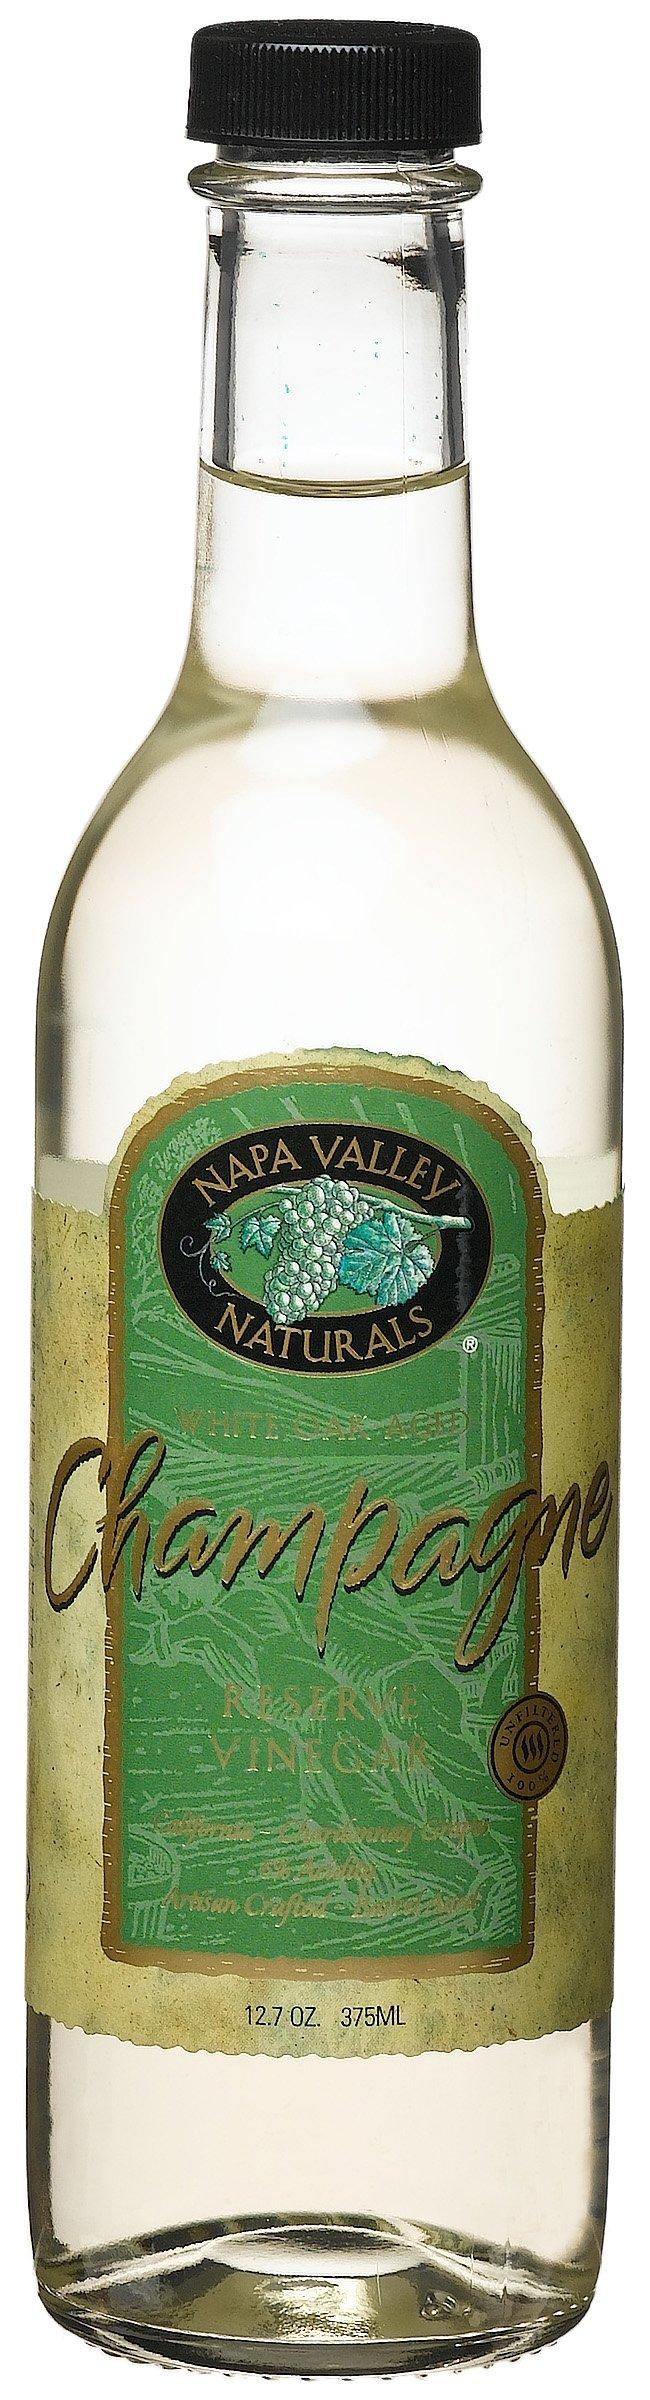 Napa Valley, Champagne Vinegar, 12.7 oz by Napa Valley Naturals (Image #1)